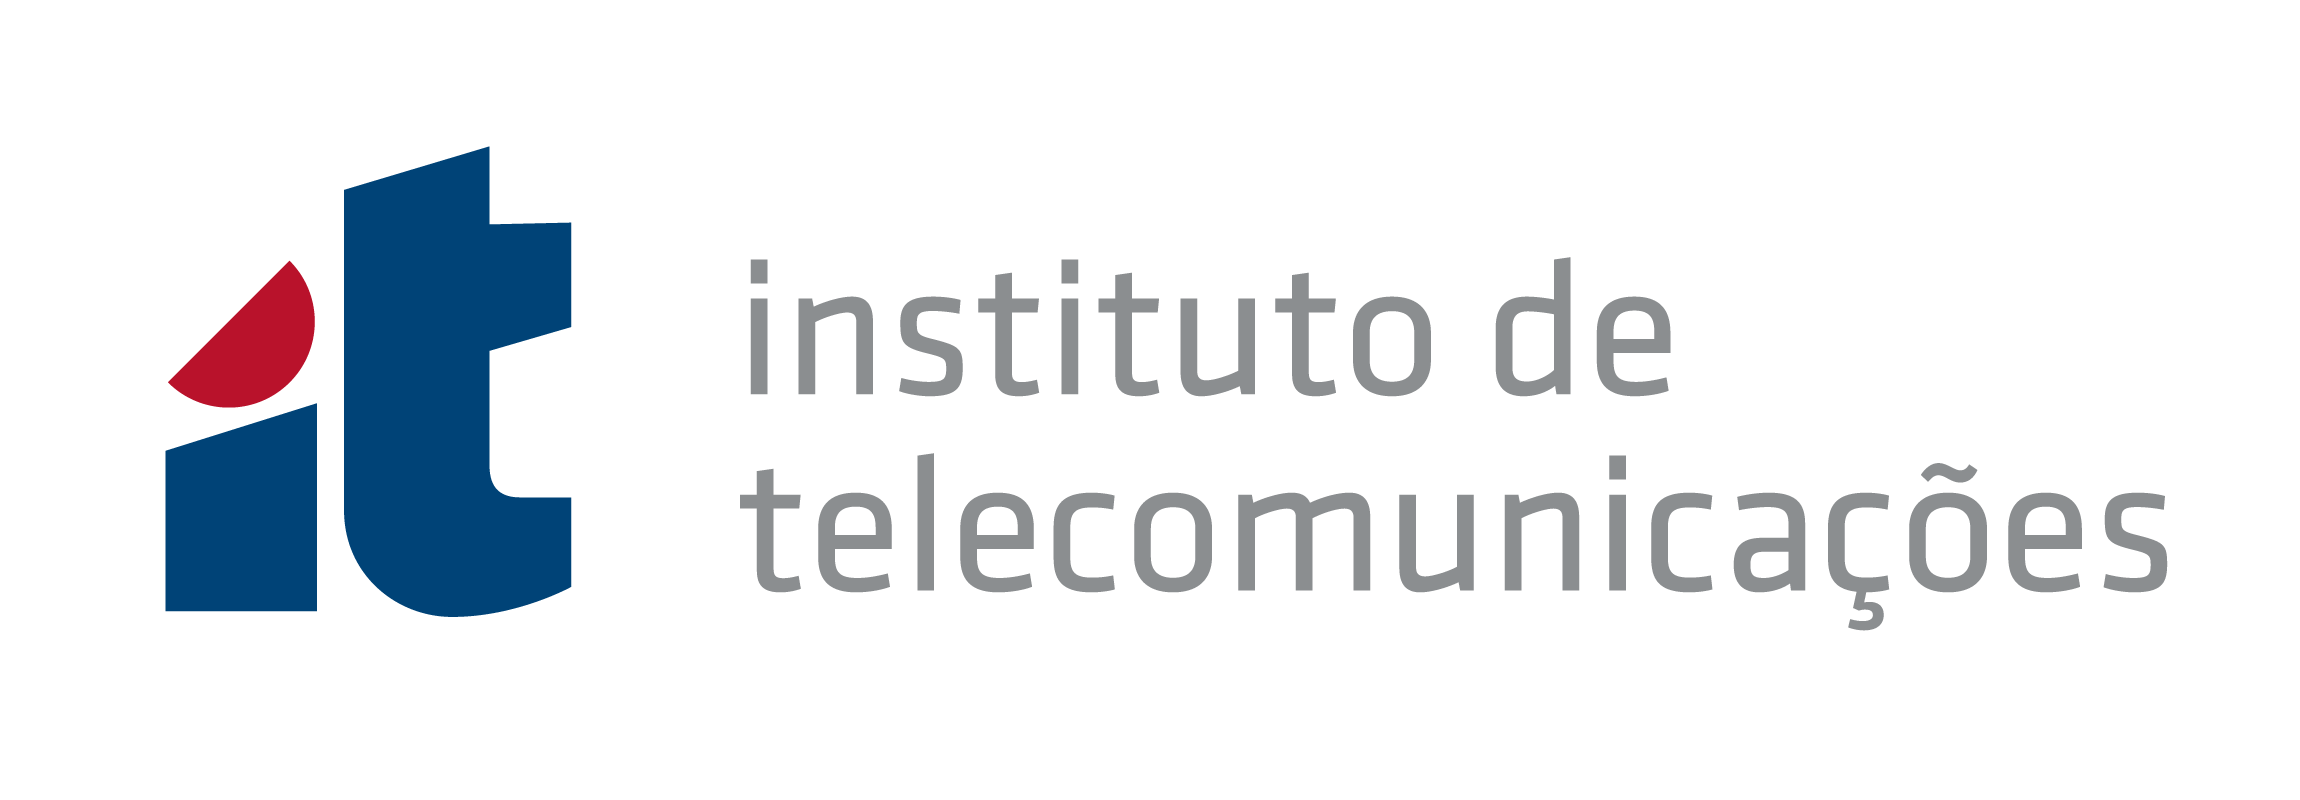 IT - Instituto de Telecomunicacoes